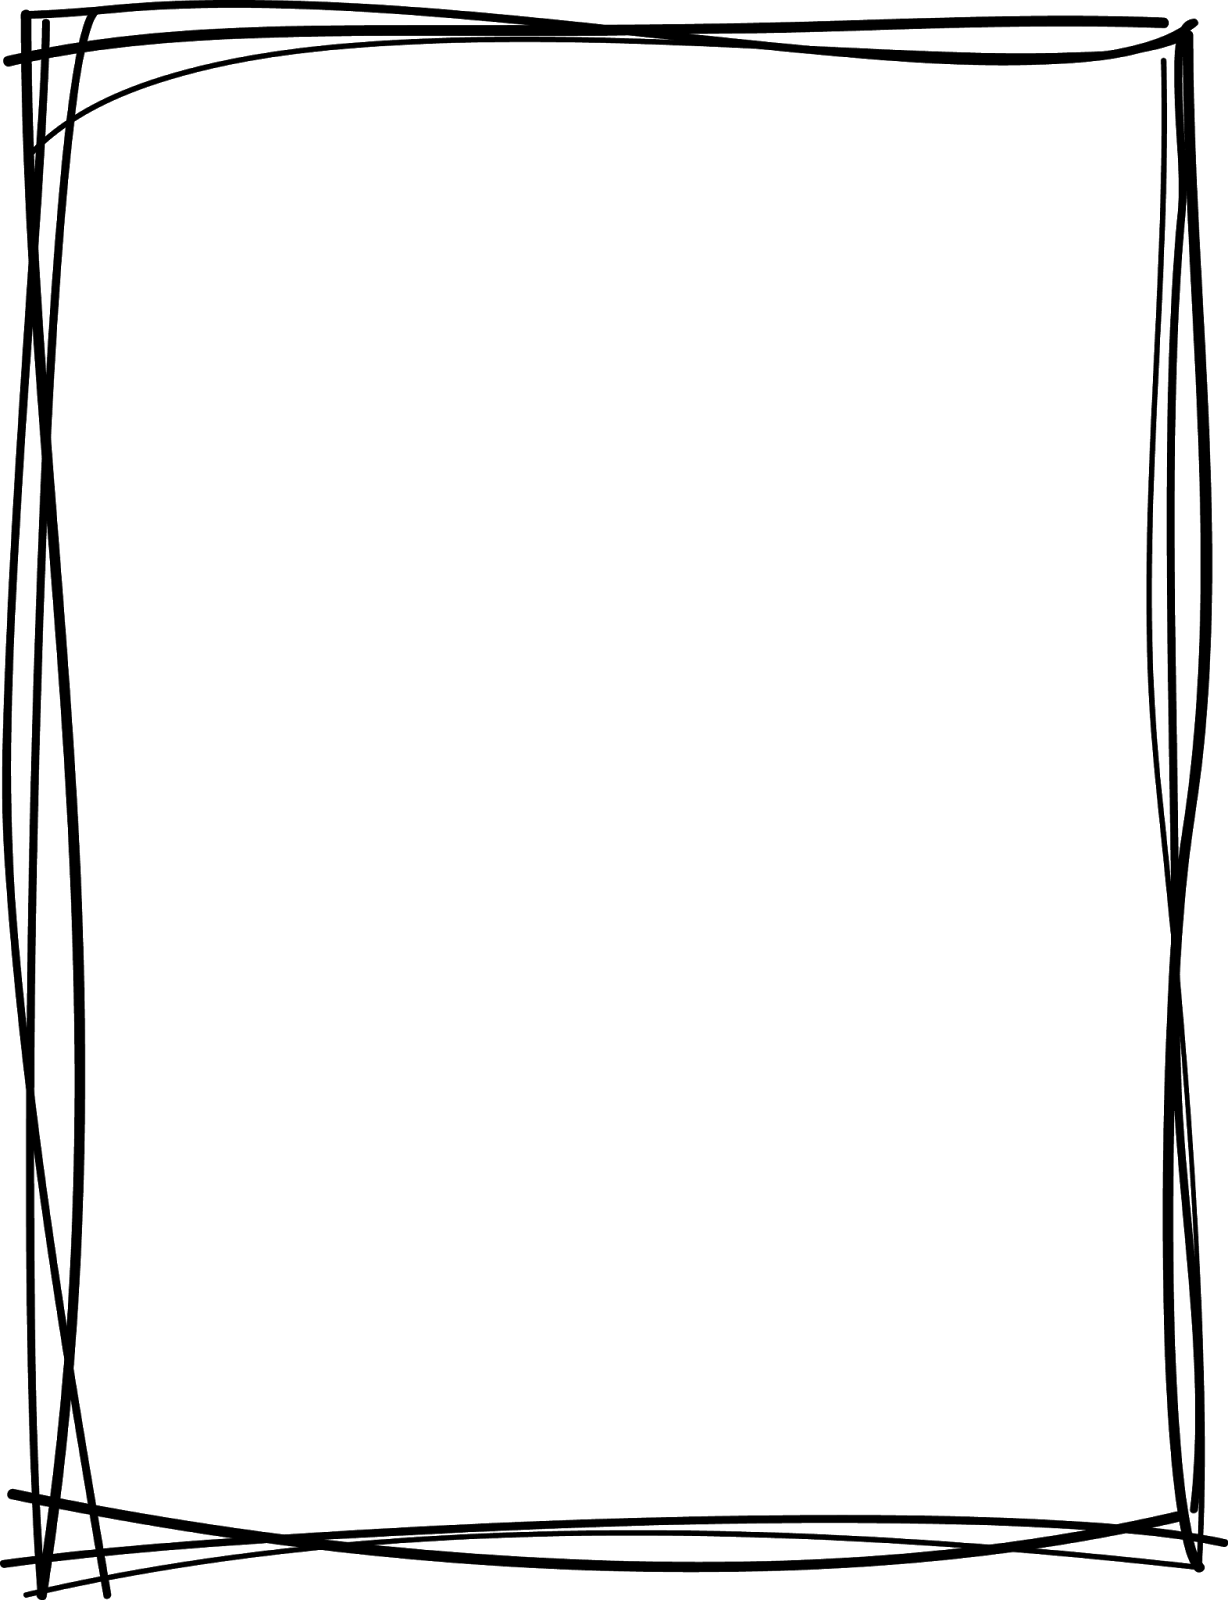 Brush Brush Rectangle Border Vector Png Quadrilateral Rectangular Border Png Transparent Clipart Image And Psd File For Free Download Overlays Picsart Digital Graphics Art Photoshop Design